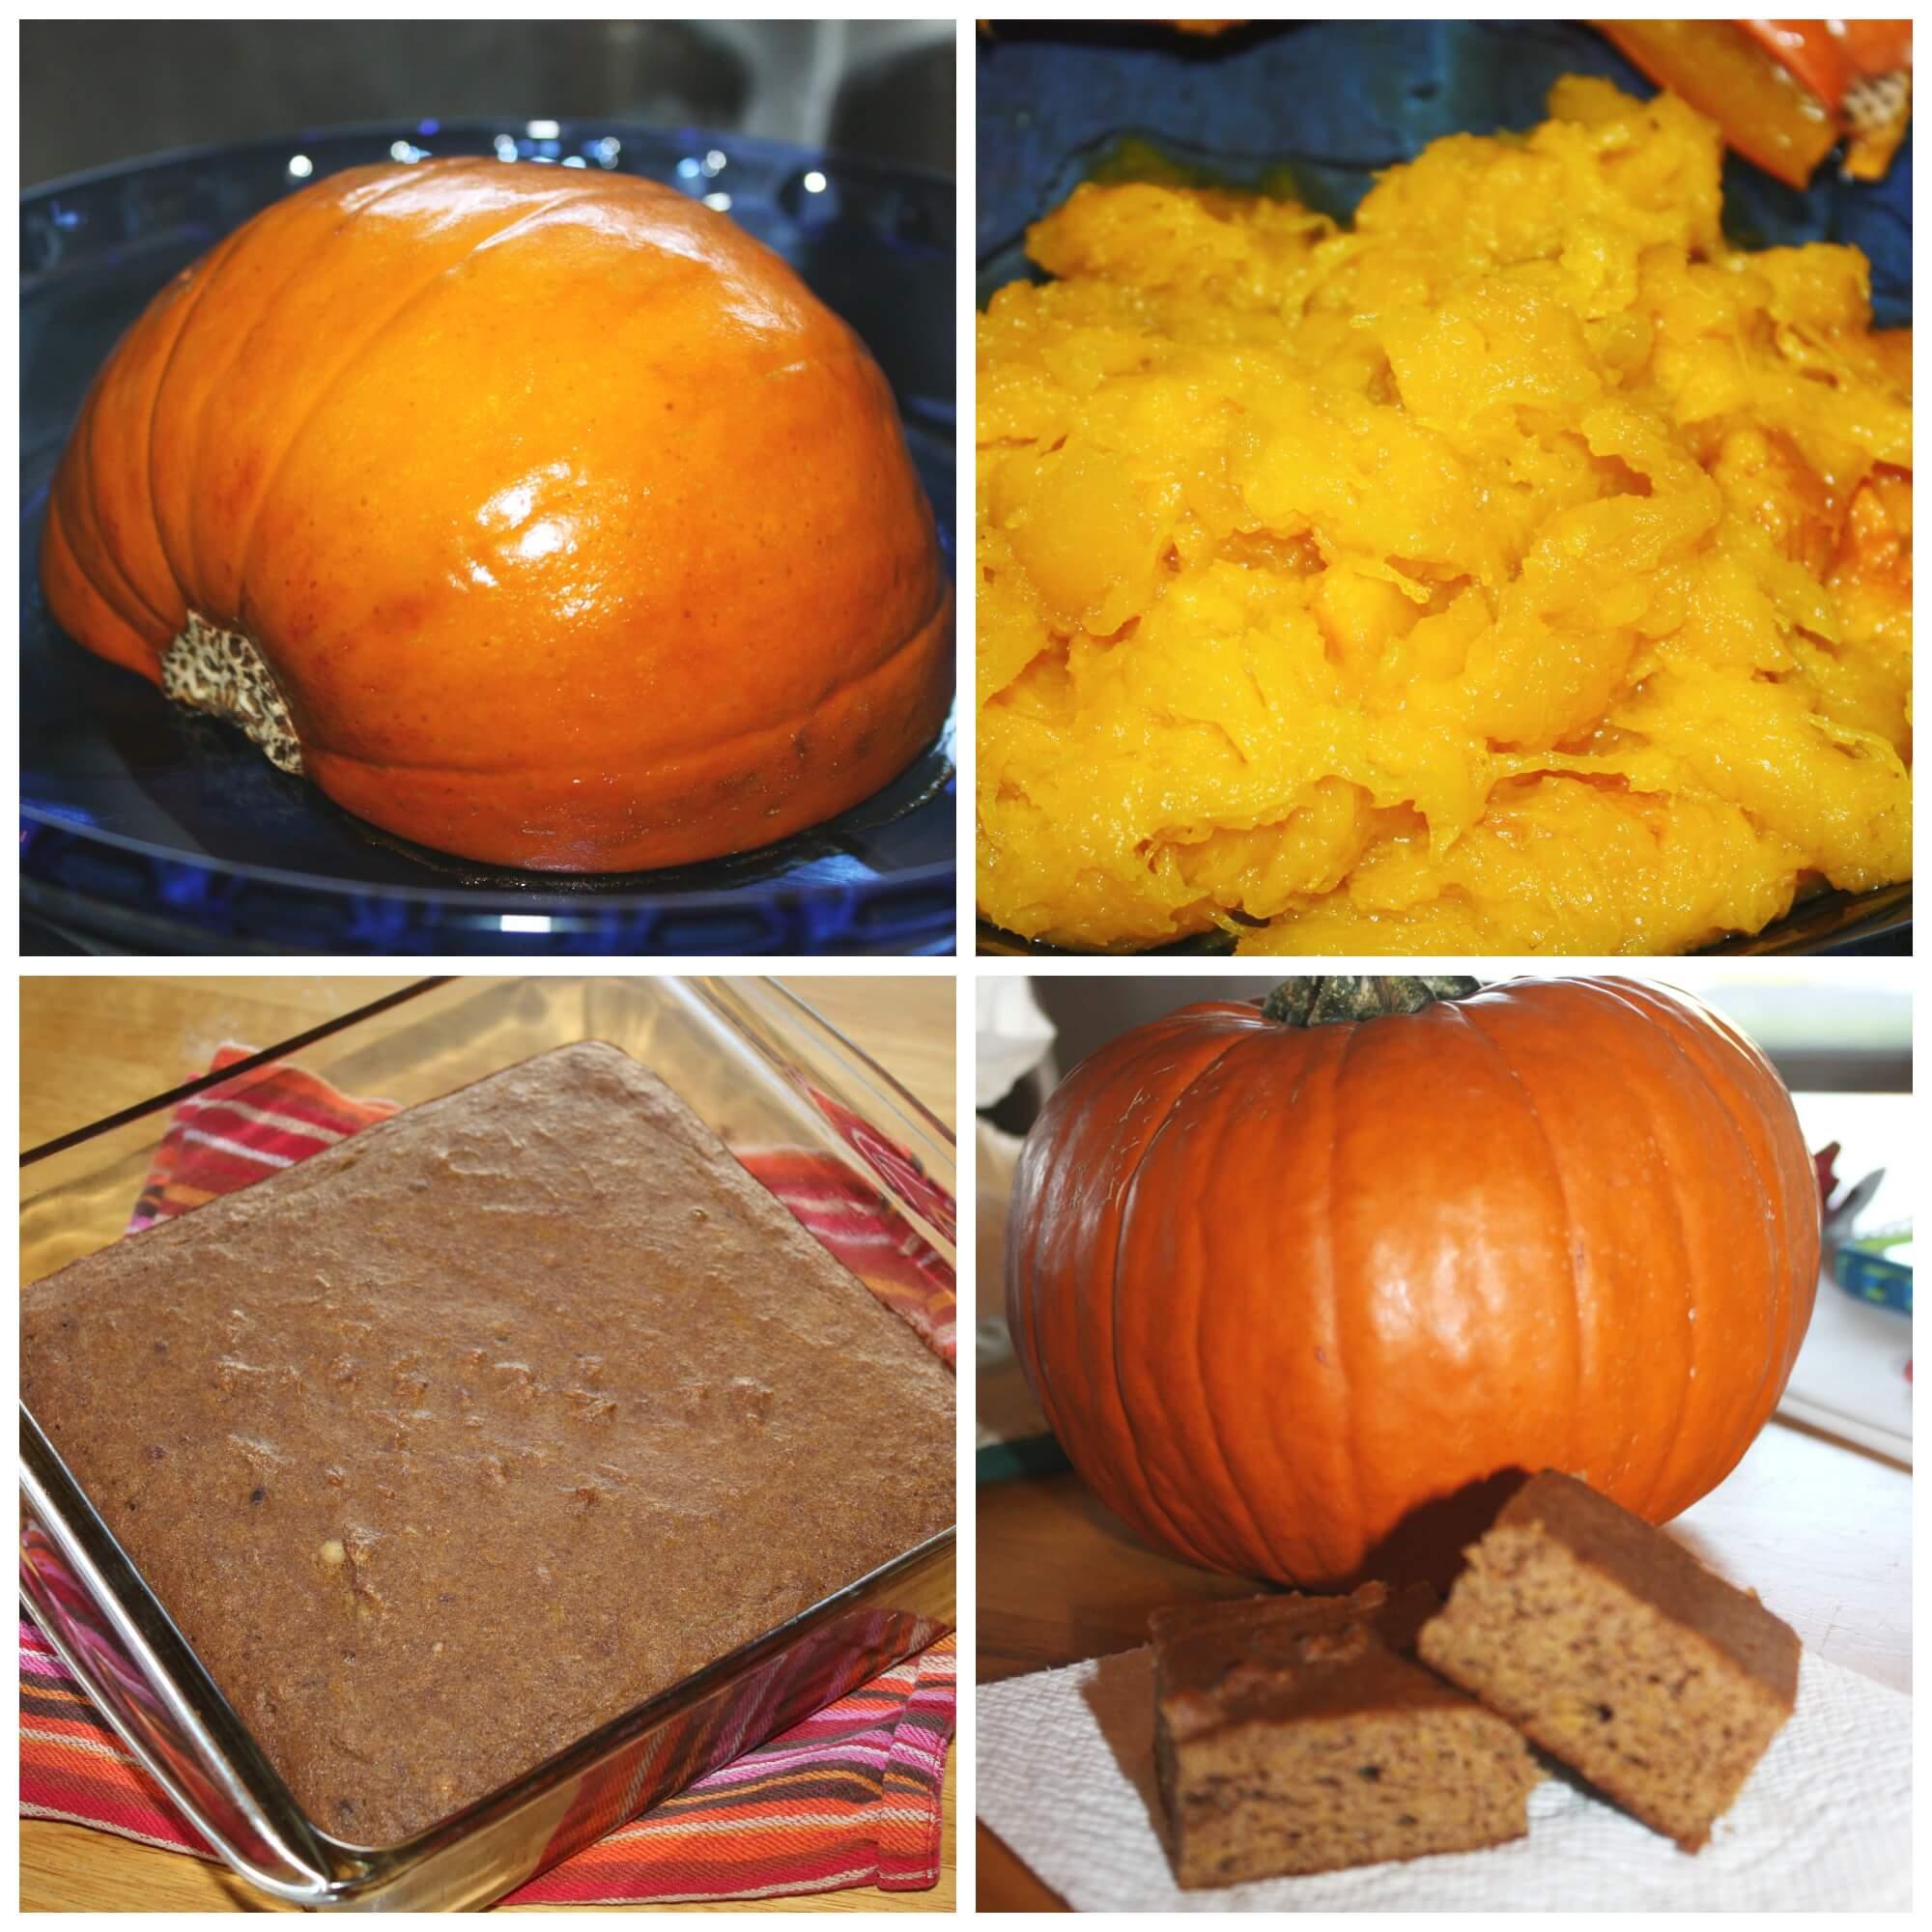 Pumpkin Activities Preschool Learning And Play